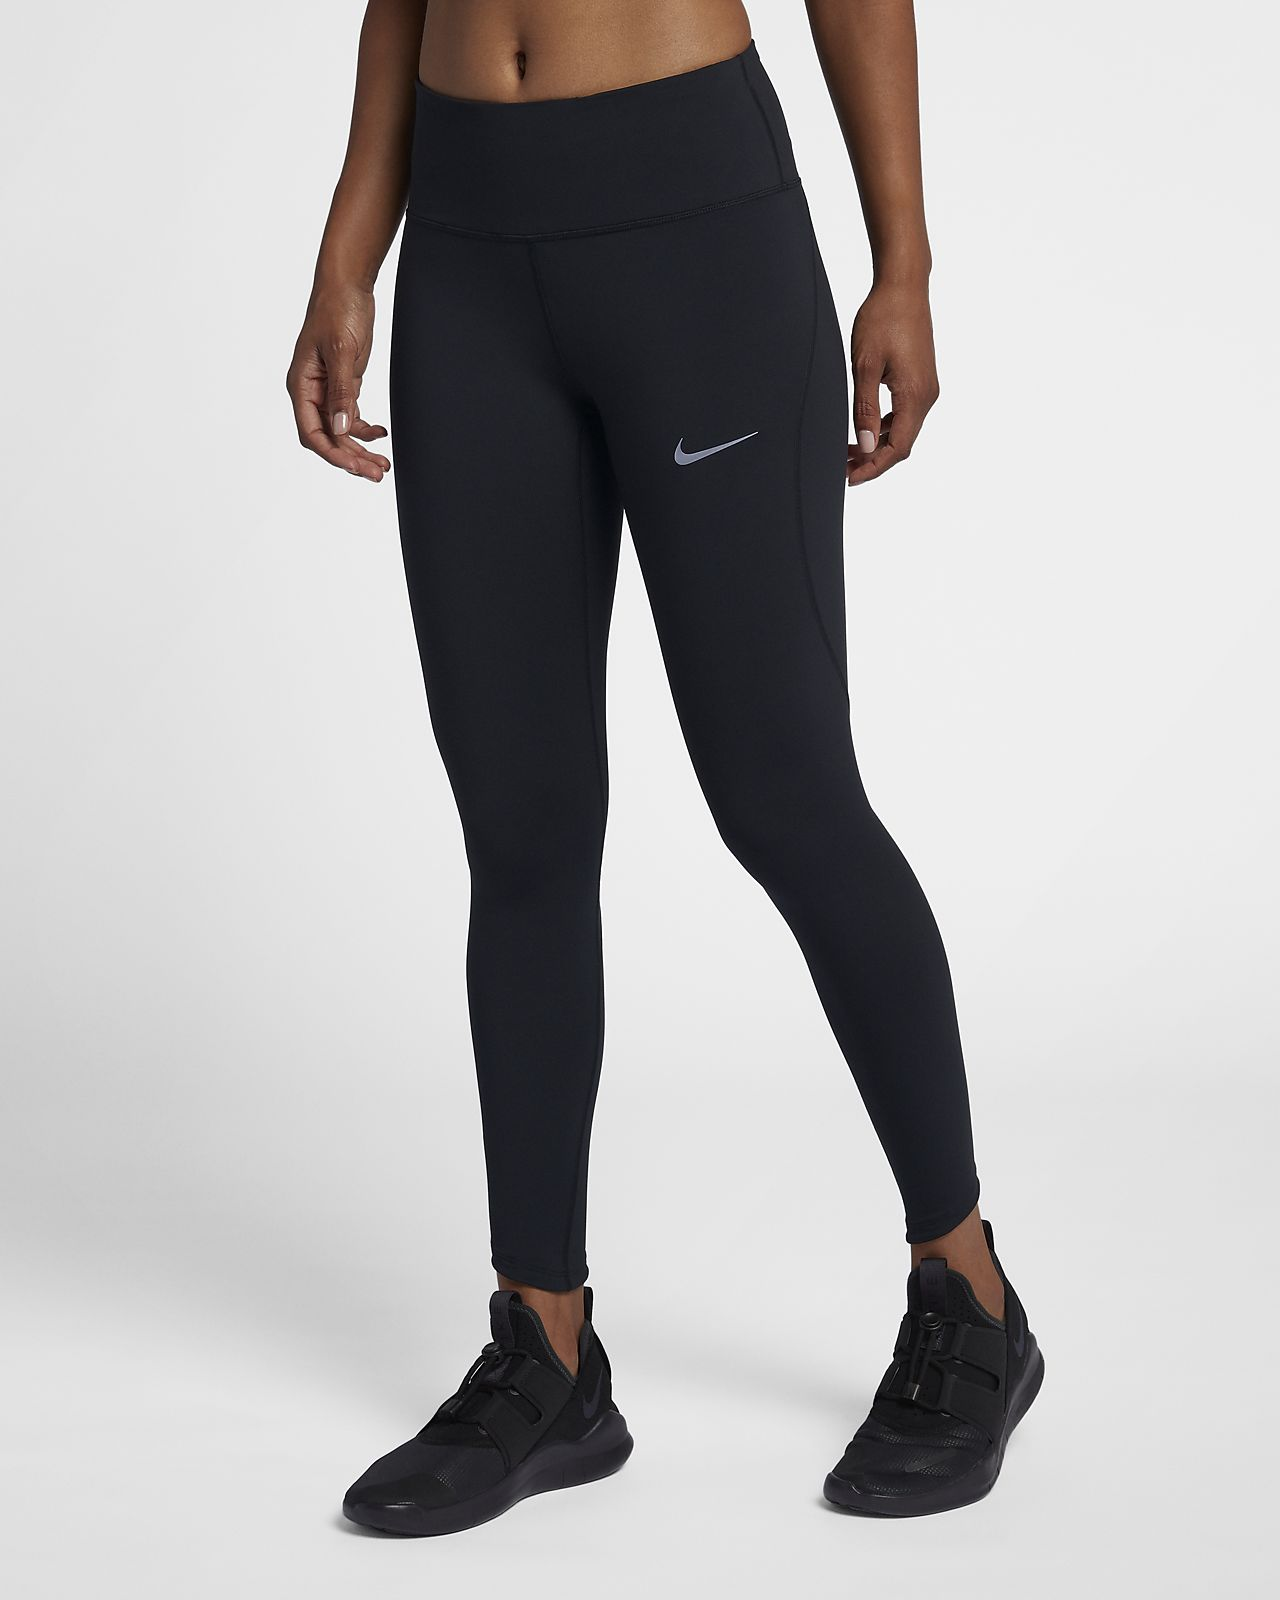 Tight de running 78 taille haute Nike Epic Lux pour Femme